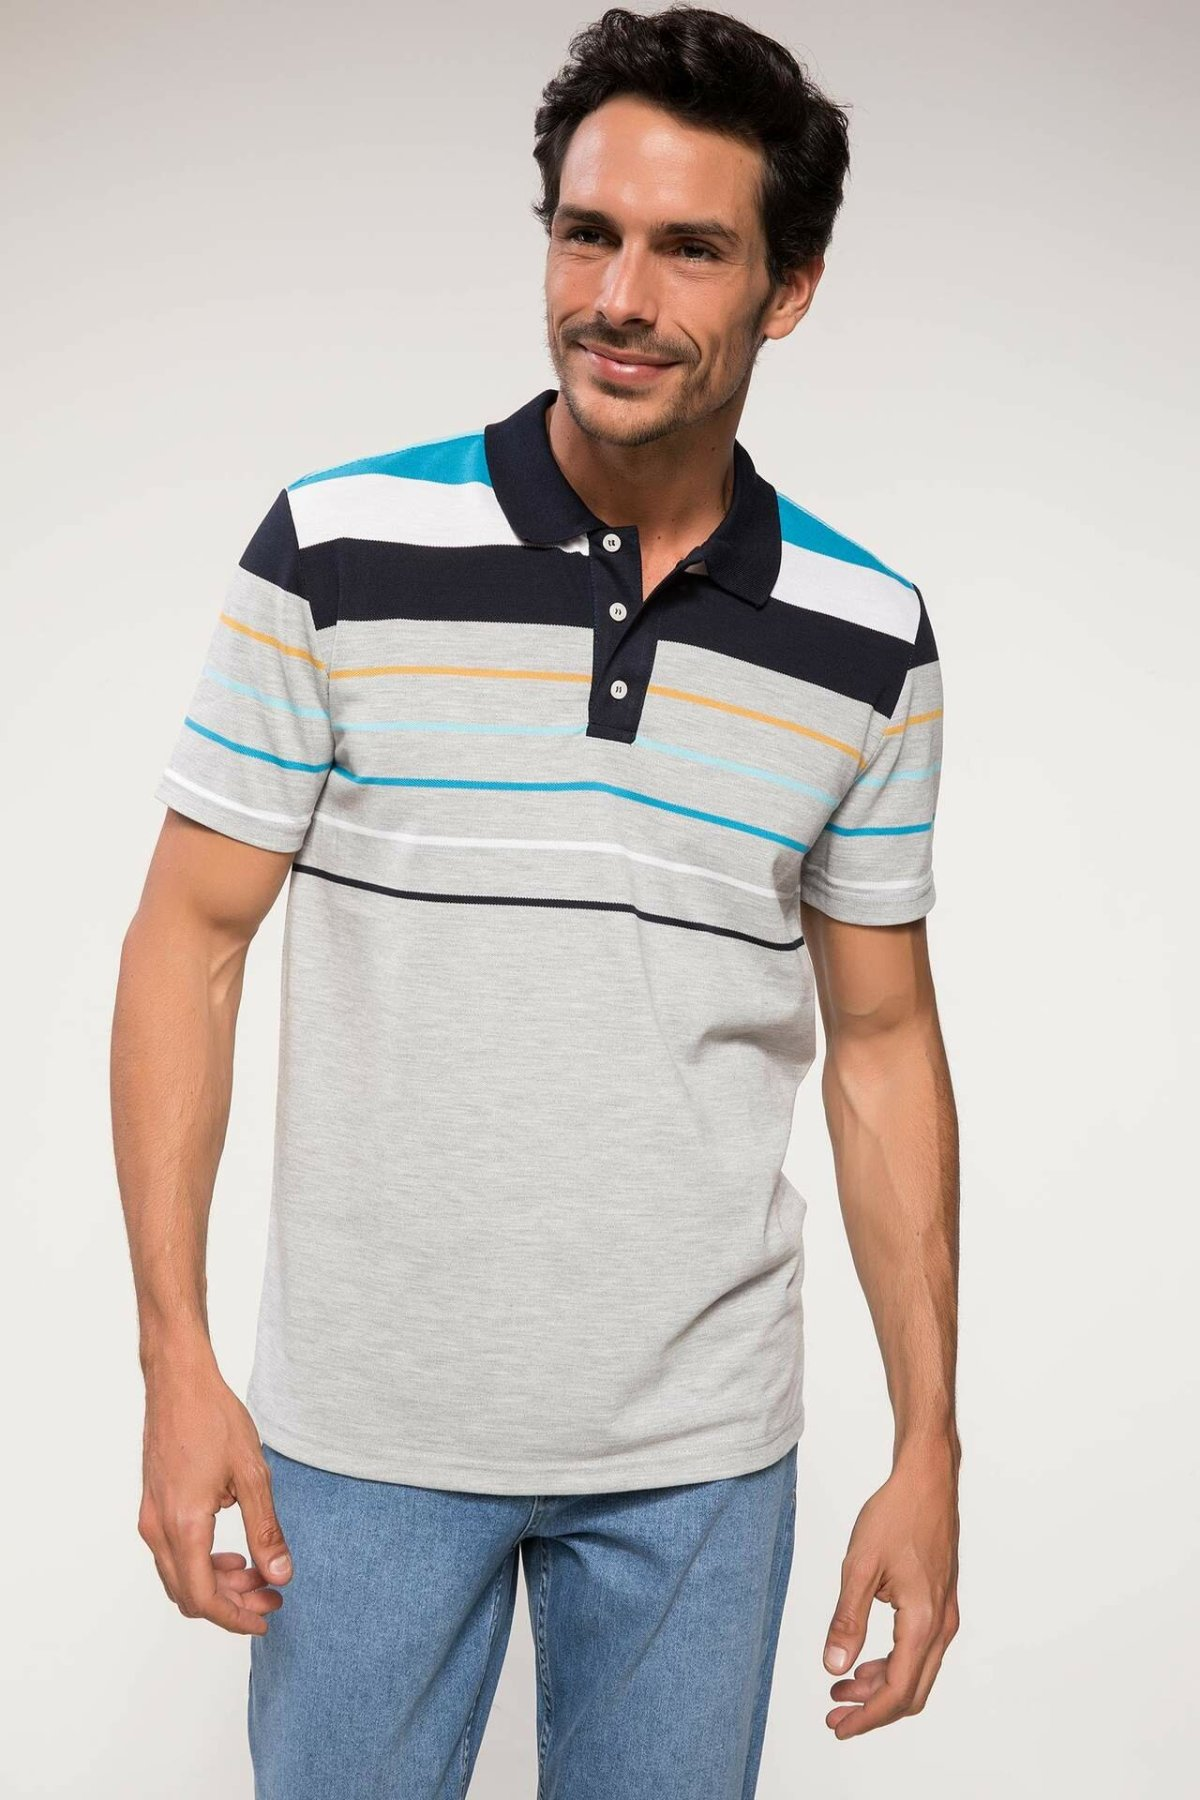 DeFacto New Man Fashion Polo Shirt Male Casual Striped High Quality Shirt Men's Sport Loose Tops Summer - I8524AZ18SM